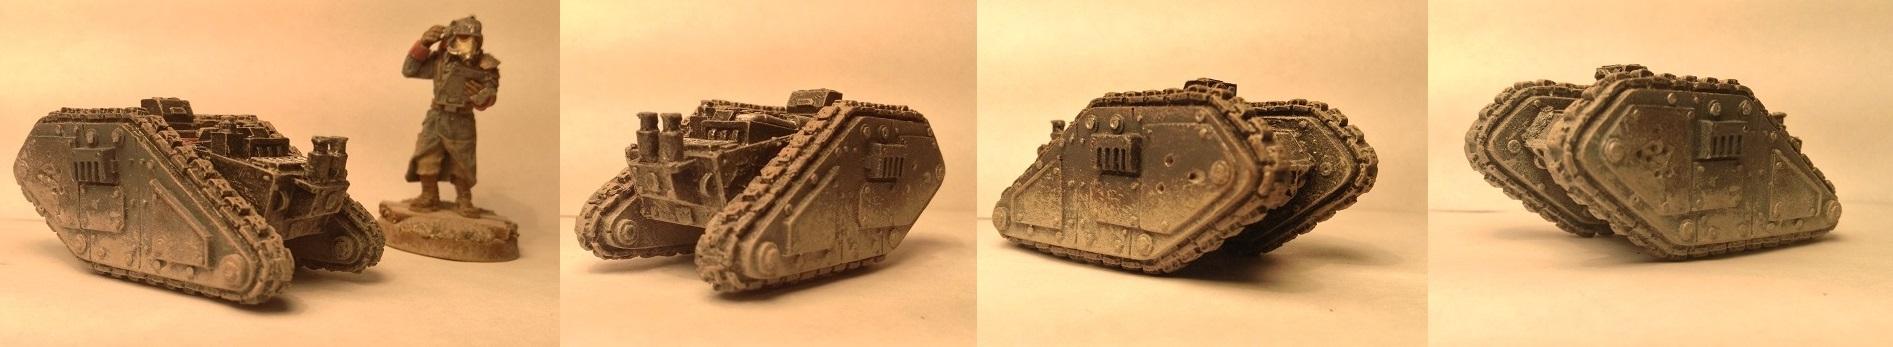 Death Korps of Krieg Cyclops Demolition vehicle by Usafkid94